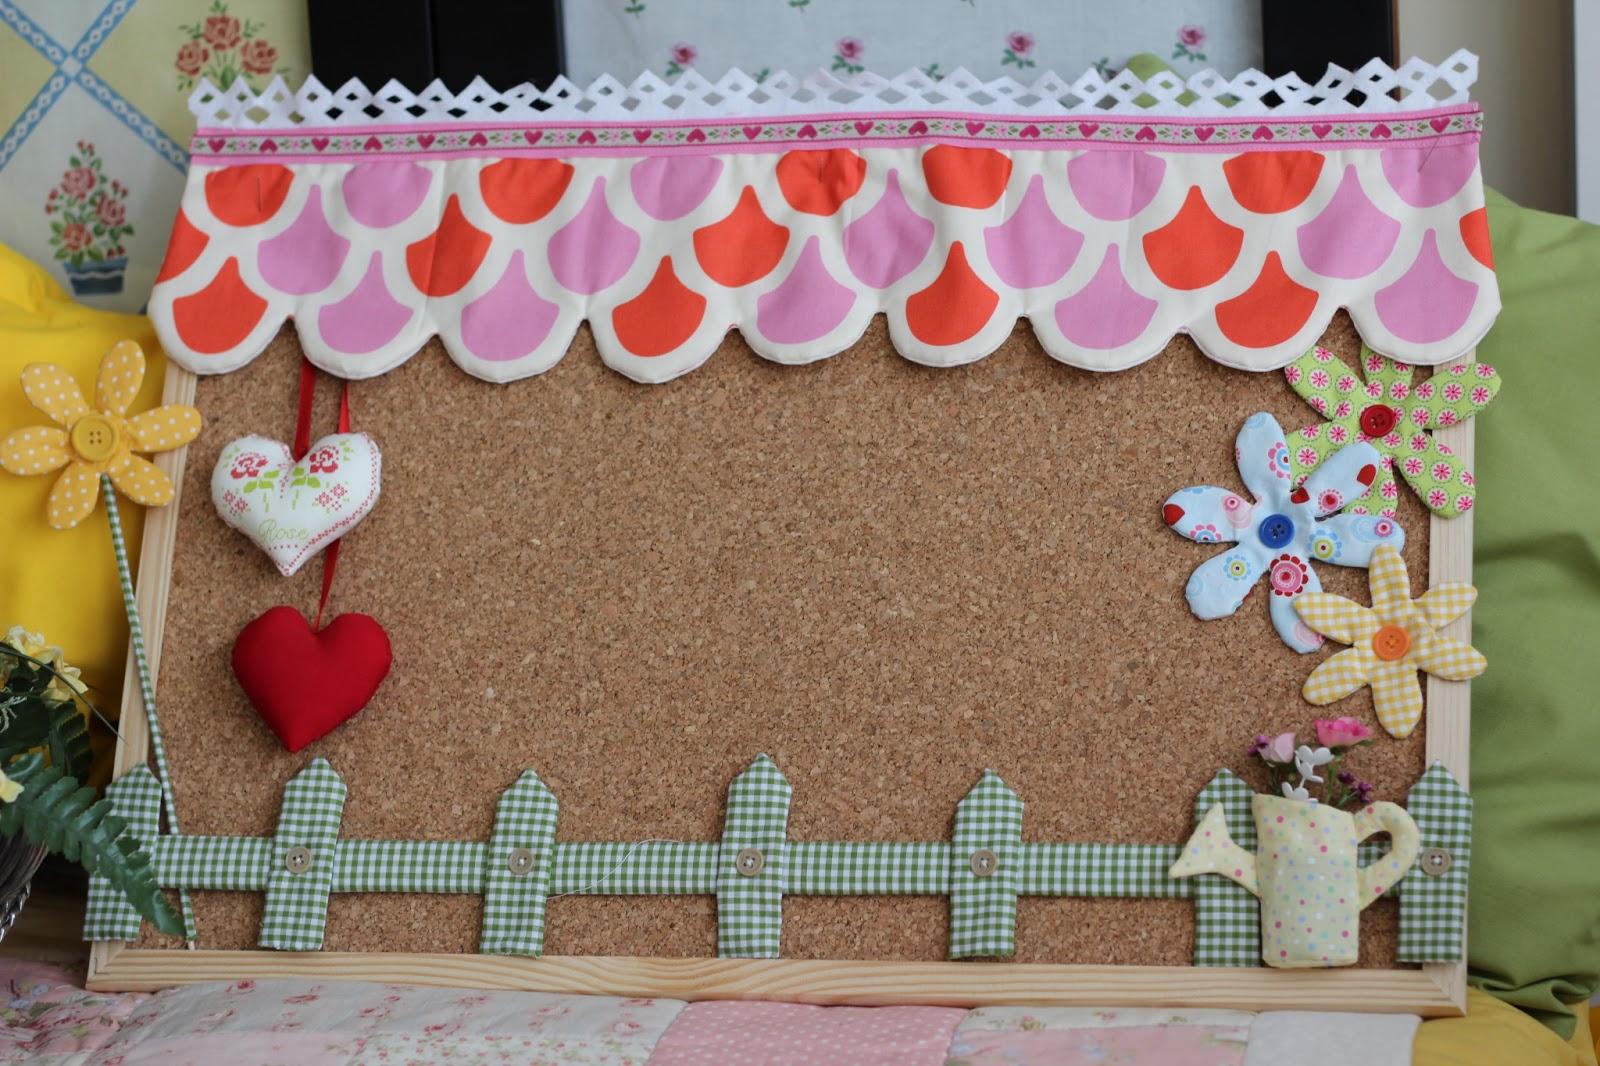 Mi hogar de patchwork corcho para habitacion infantil for Ideas para decorar mi hogar